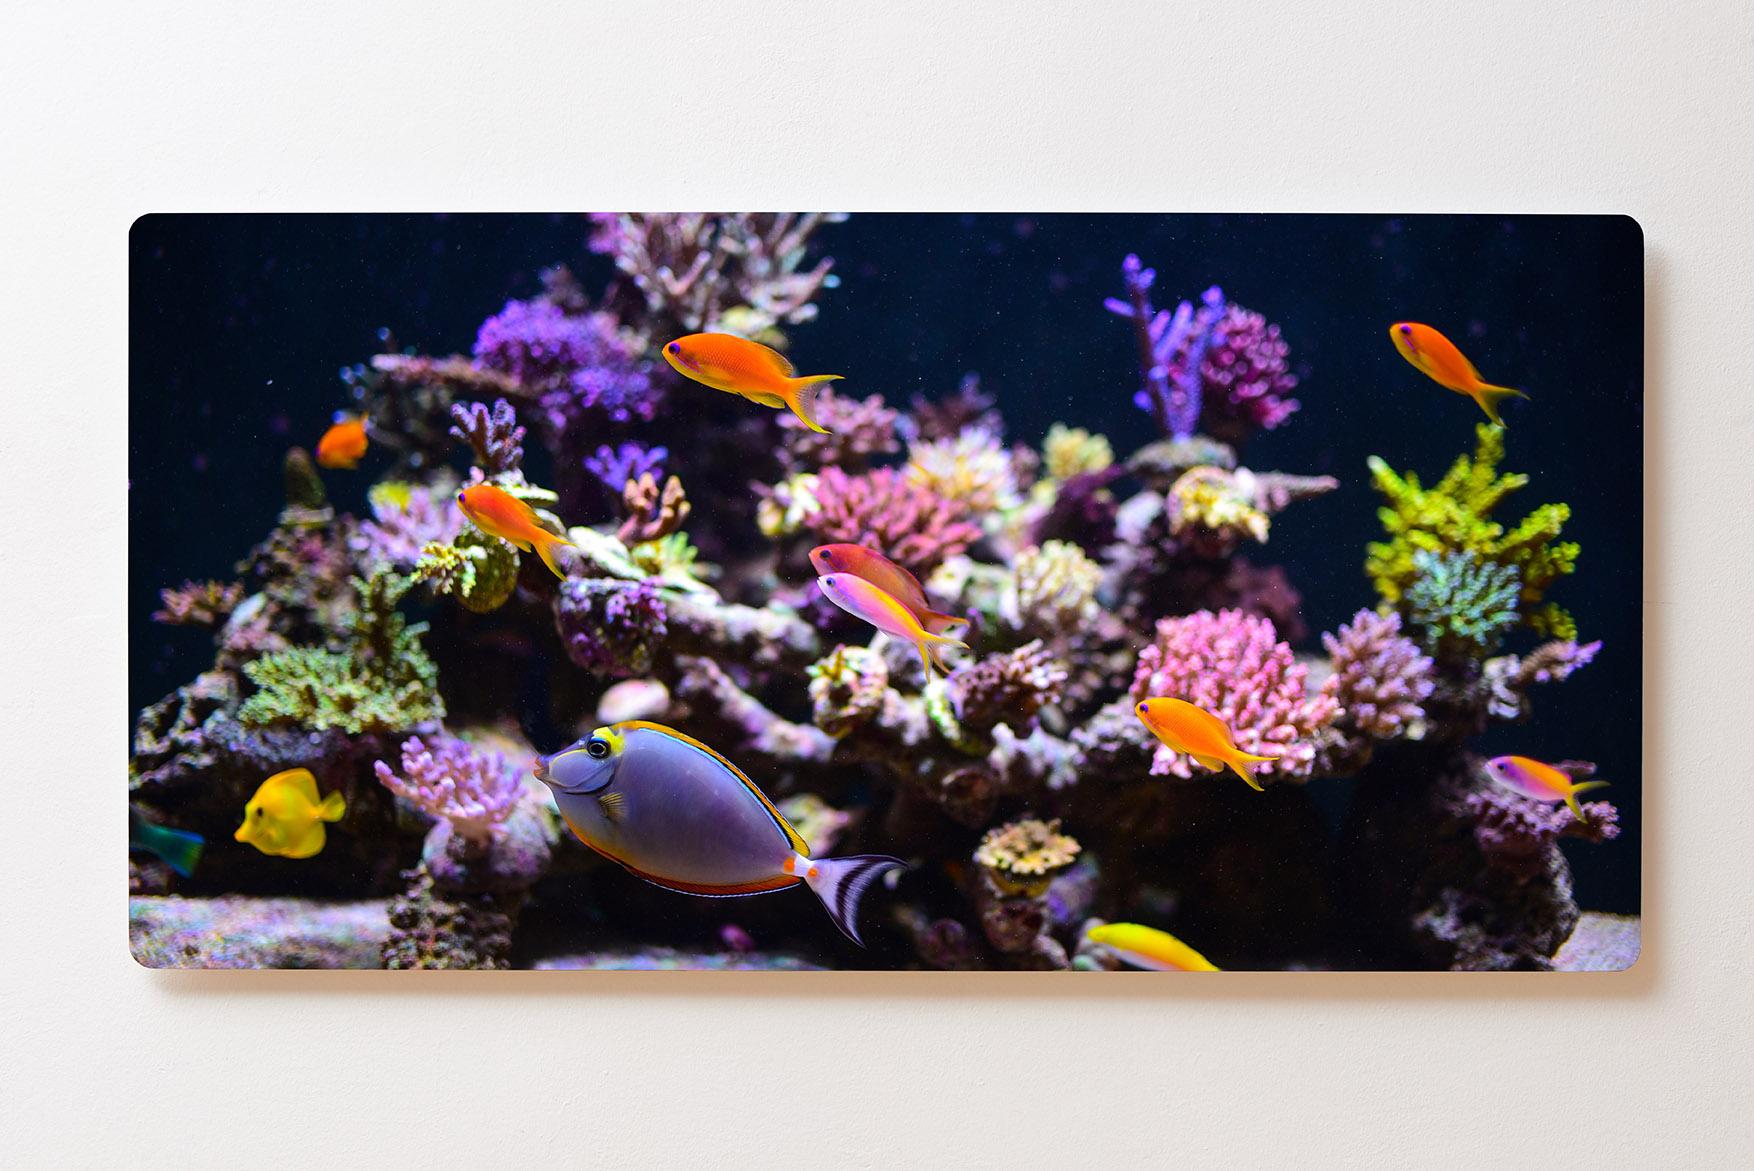 Magnettafel BACKLIGHT 120x60cm Motiv-Wandbild M135 Aquarium Fische